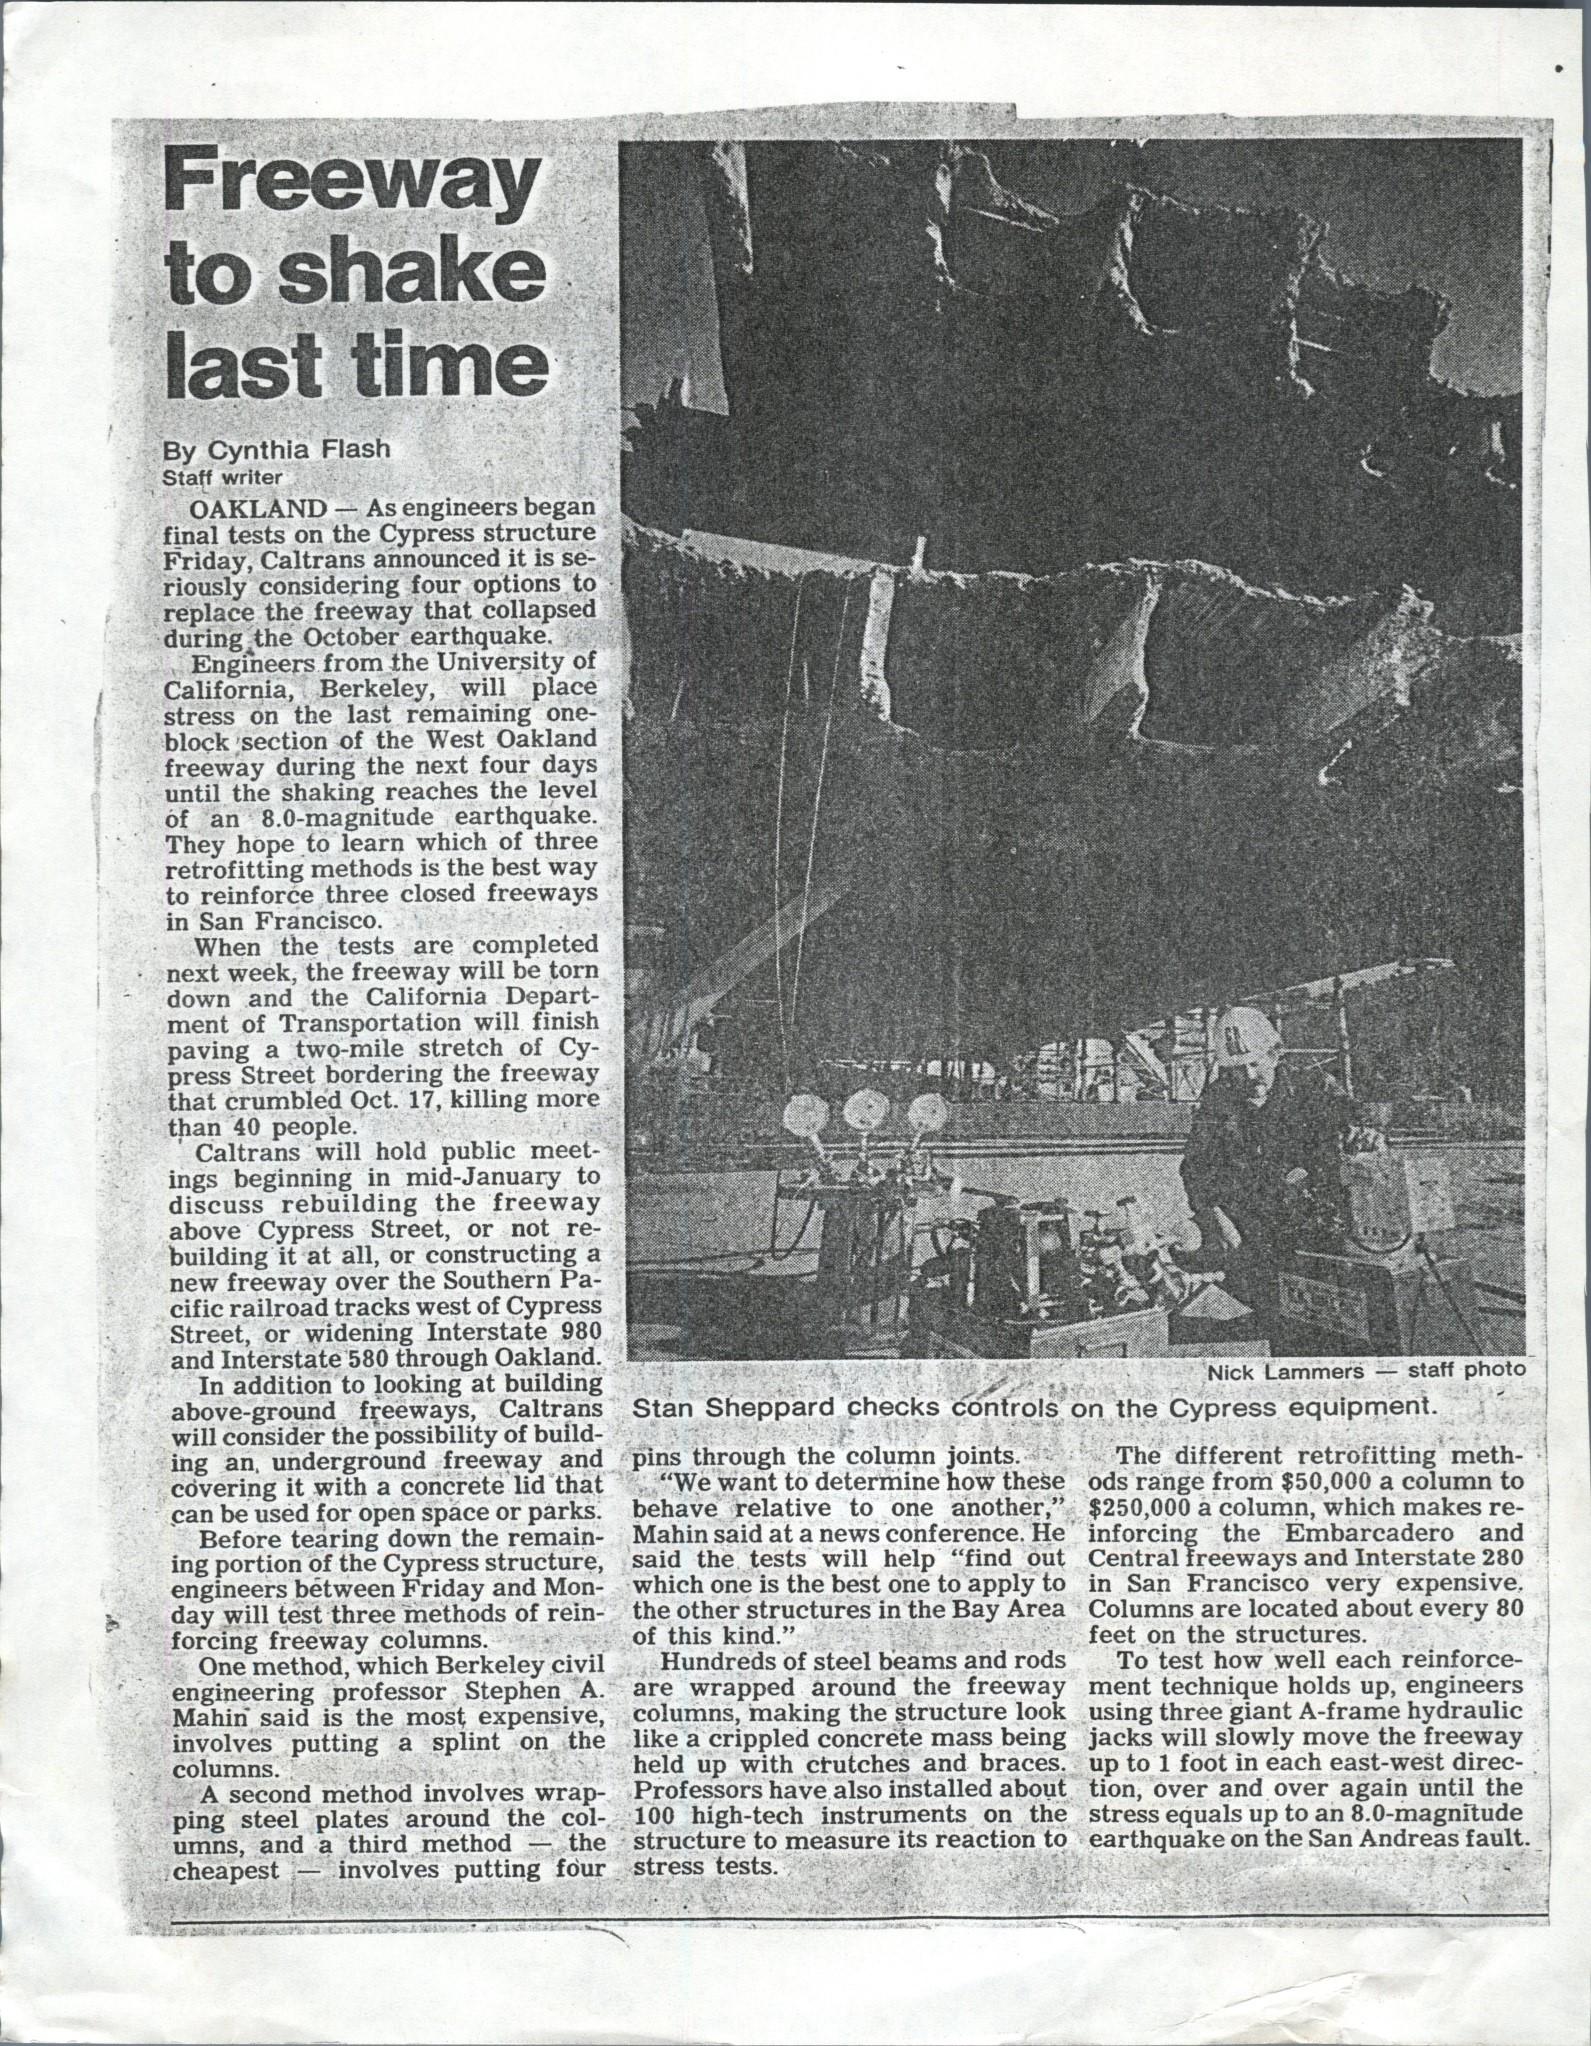 EARTHQUAKE ARTICLE